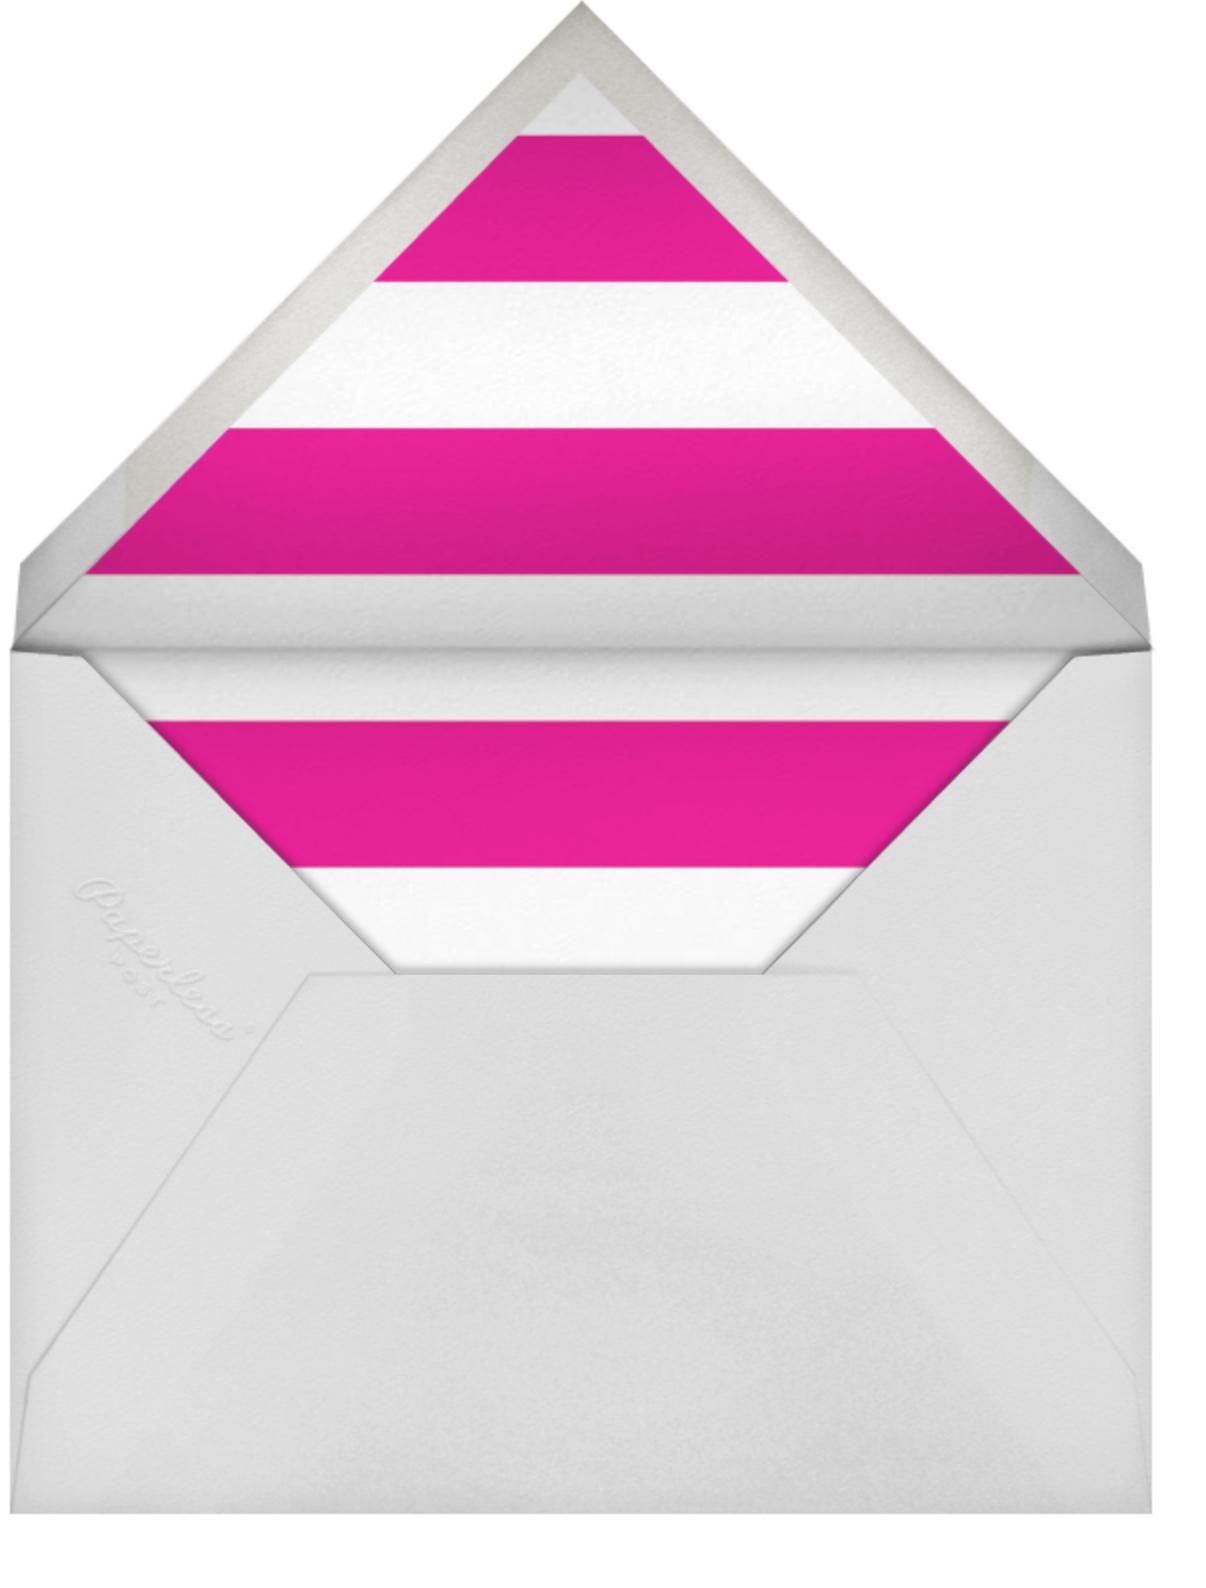 Stripe Suite (Stationery) - Pink - kate spade new york - Envelope